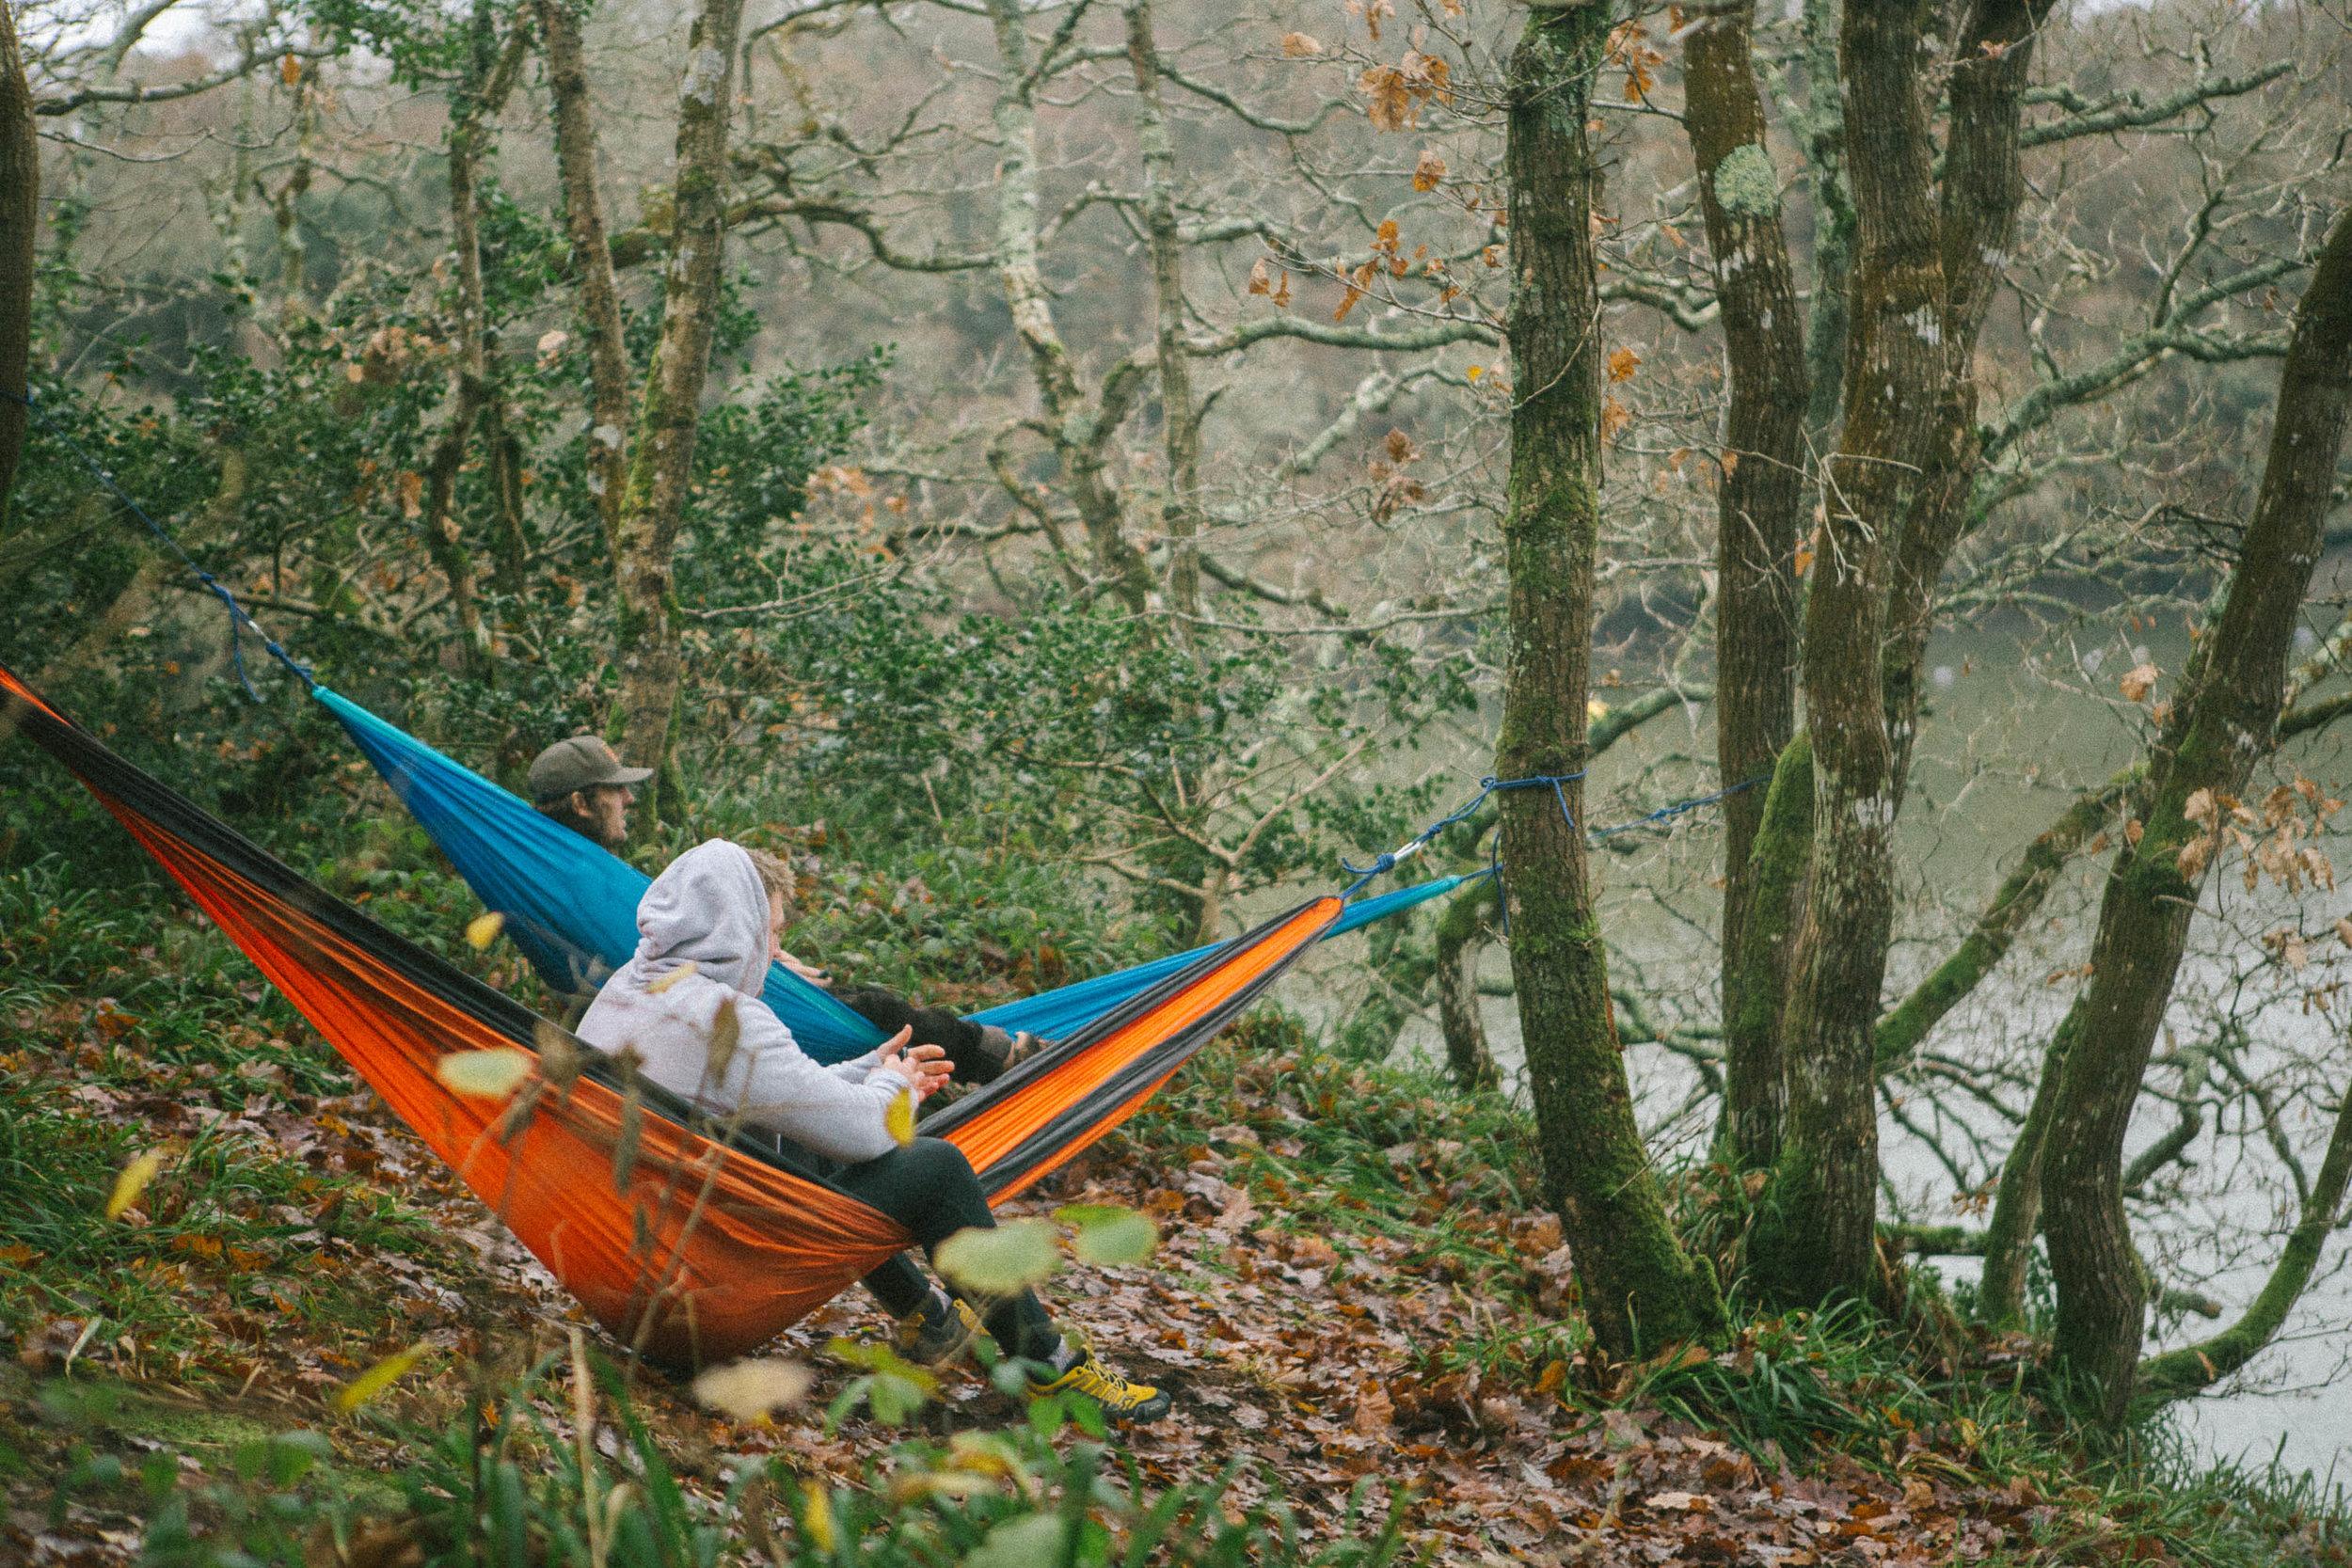 Thera-Sea camping hammocks